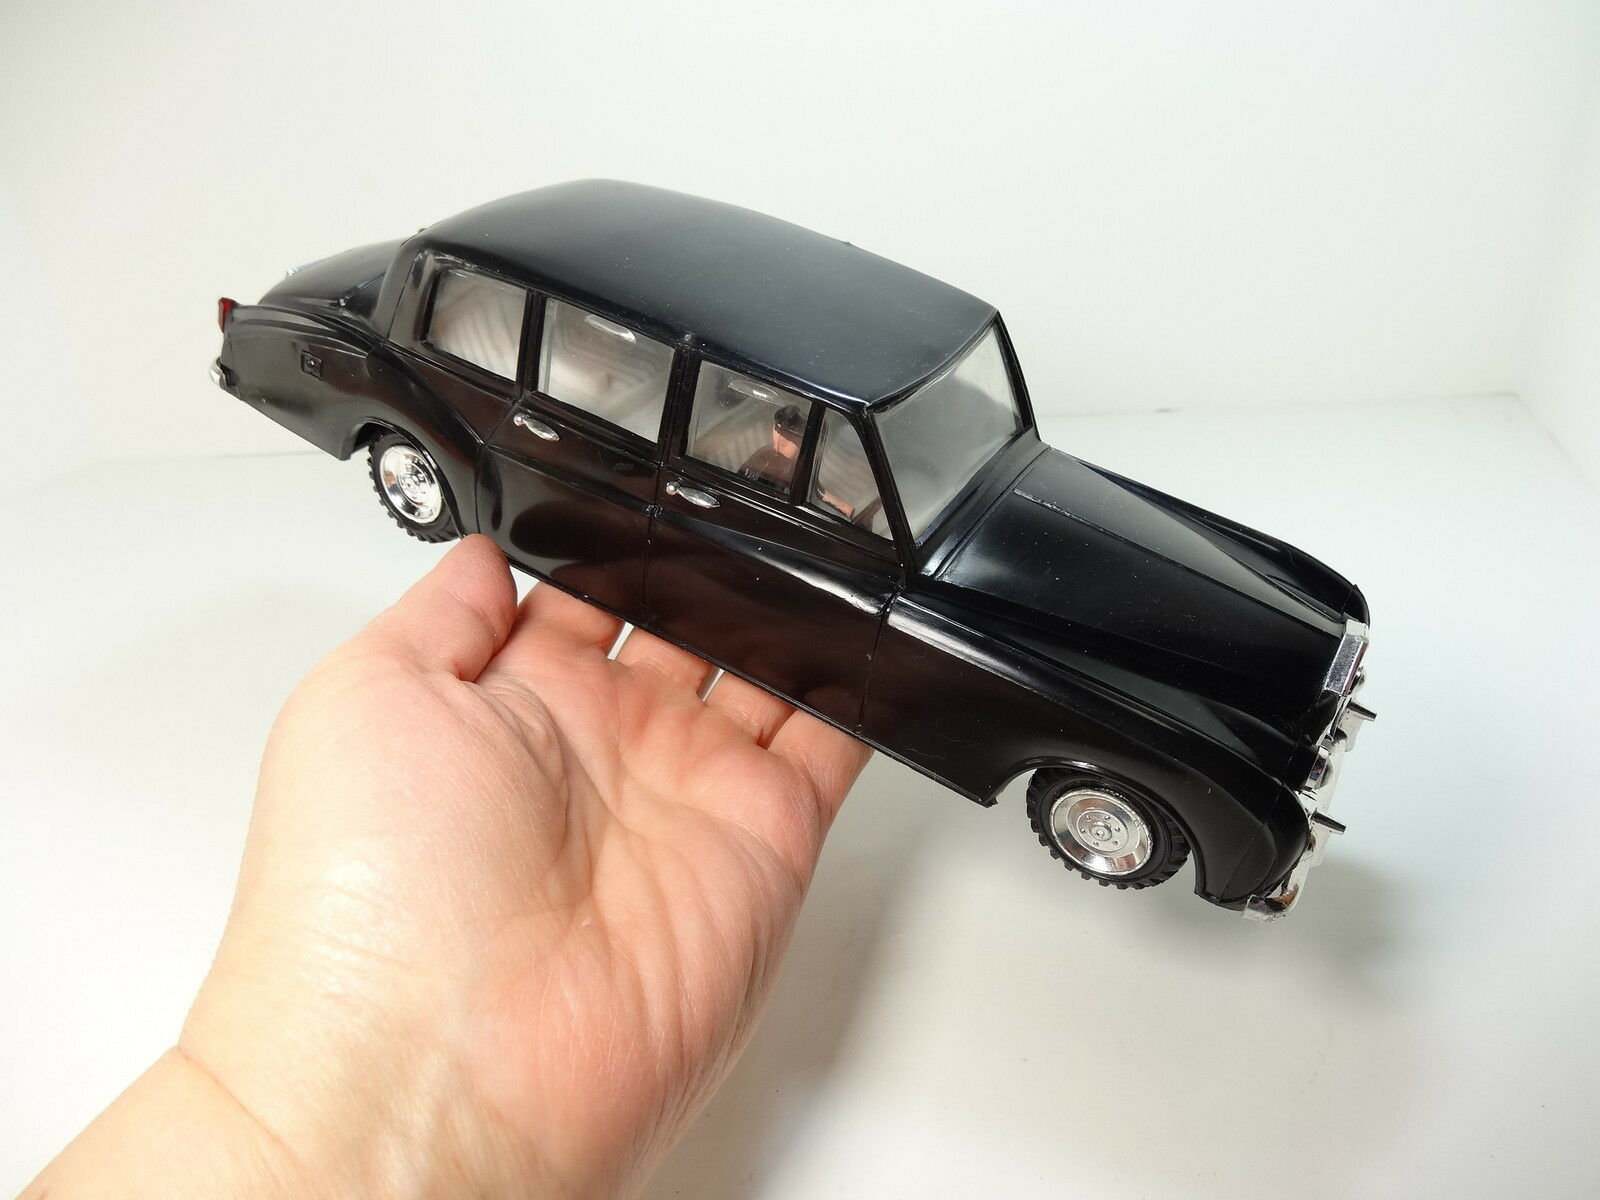 NFIC Hong Kong Rolls Royce vintage 11  friction jouet voiture Noir Limousine Windows bouge